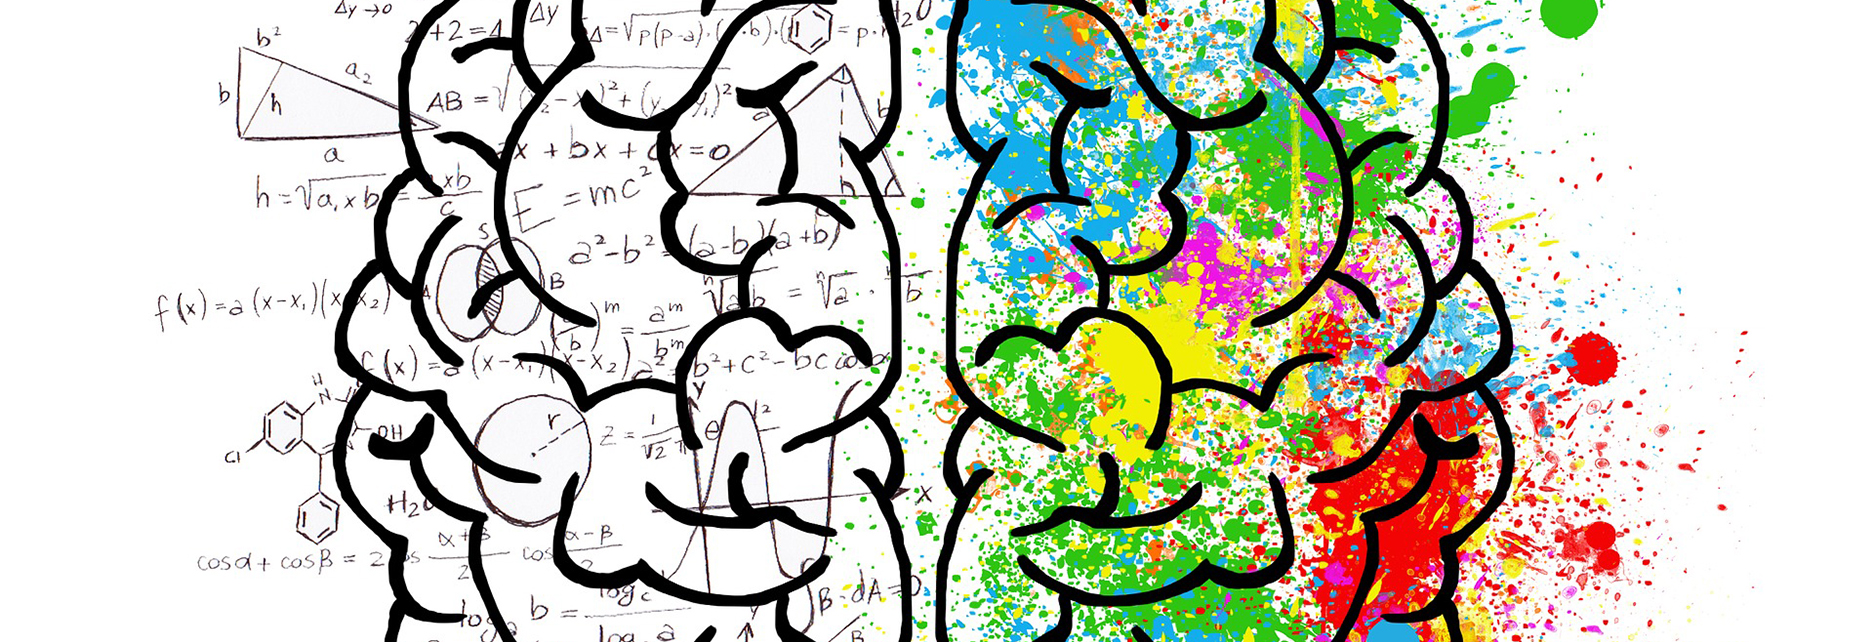 atelier-stabilo-apprendre-autrement-carte-mentale-1860x650px.jpg